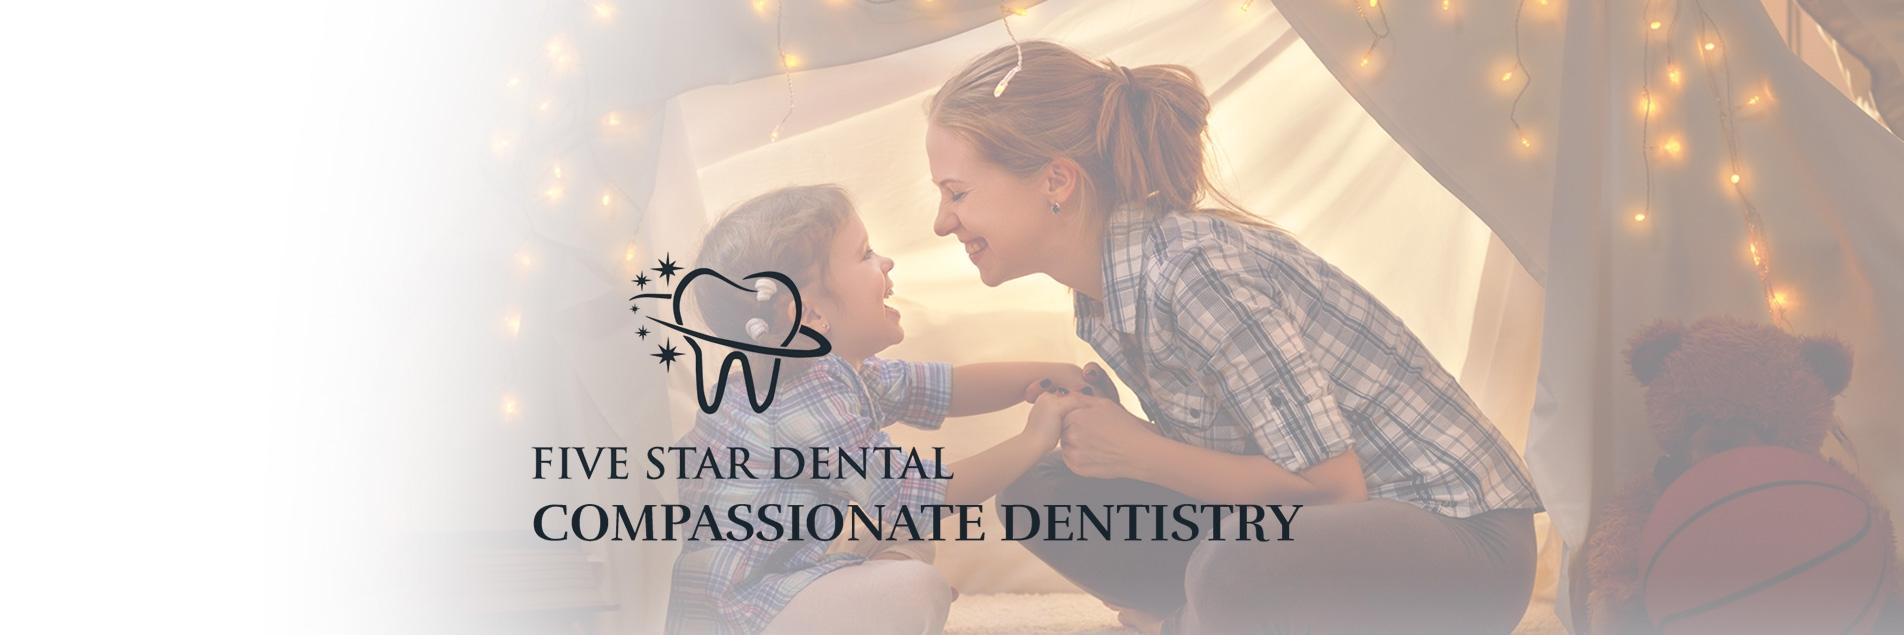 Five Star Dental LLC (@fivestardentalllc) Cover Image